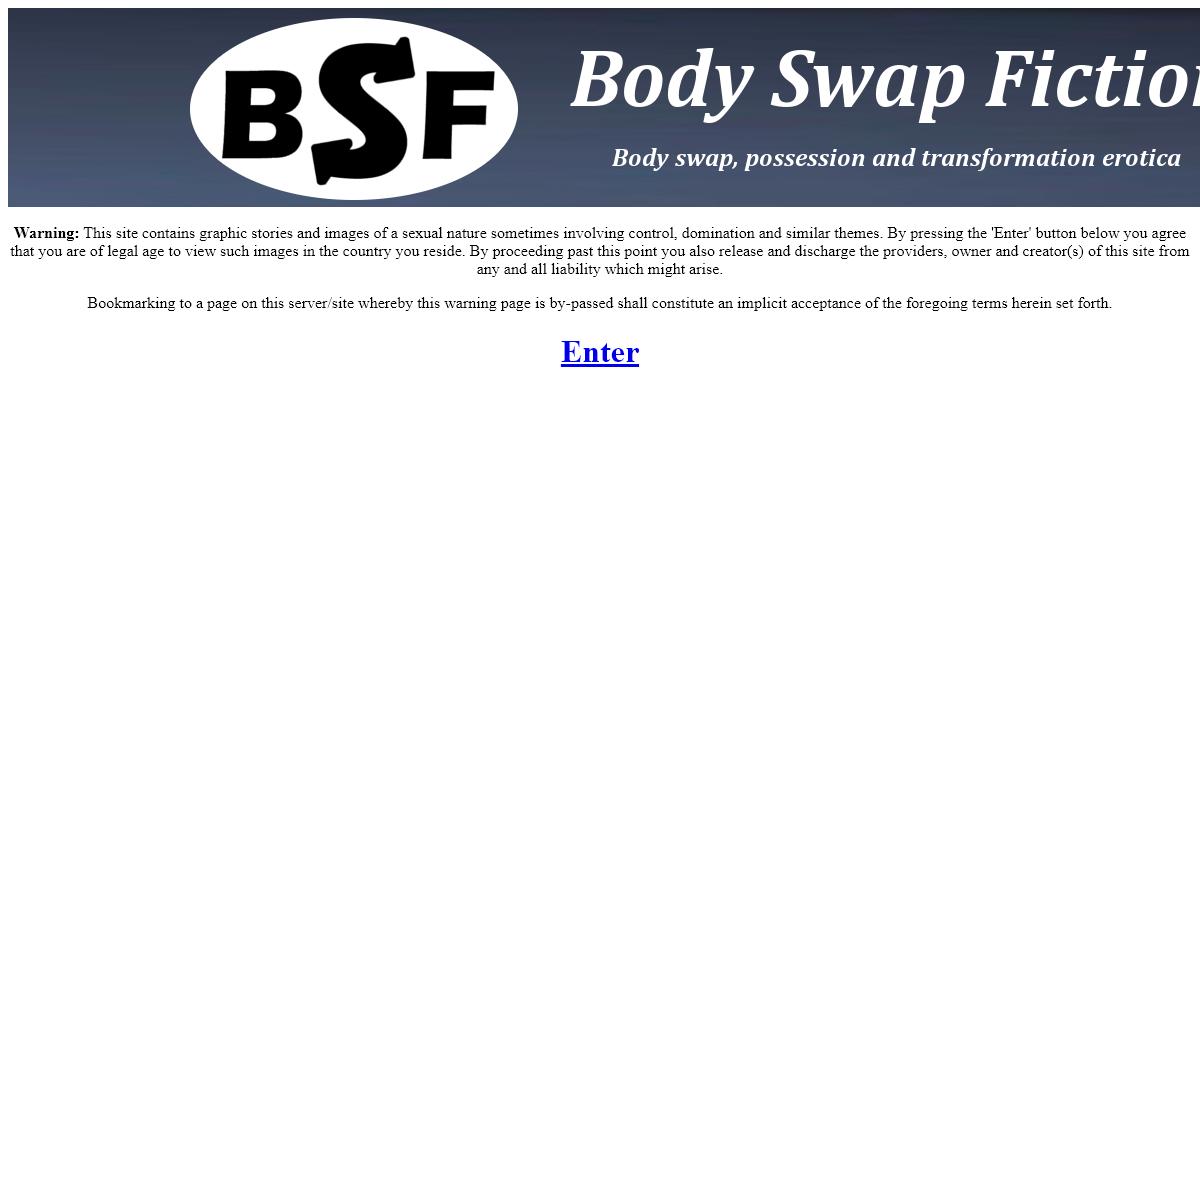 A complete backup of www.bodyswapfiction.com